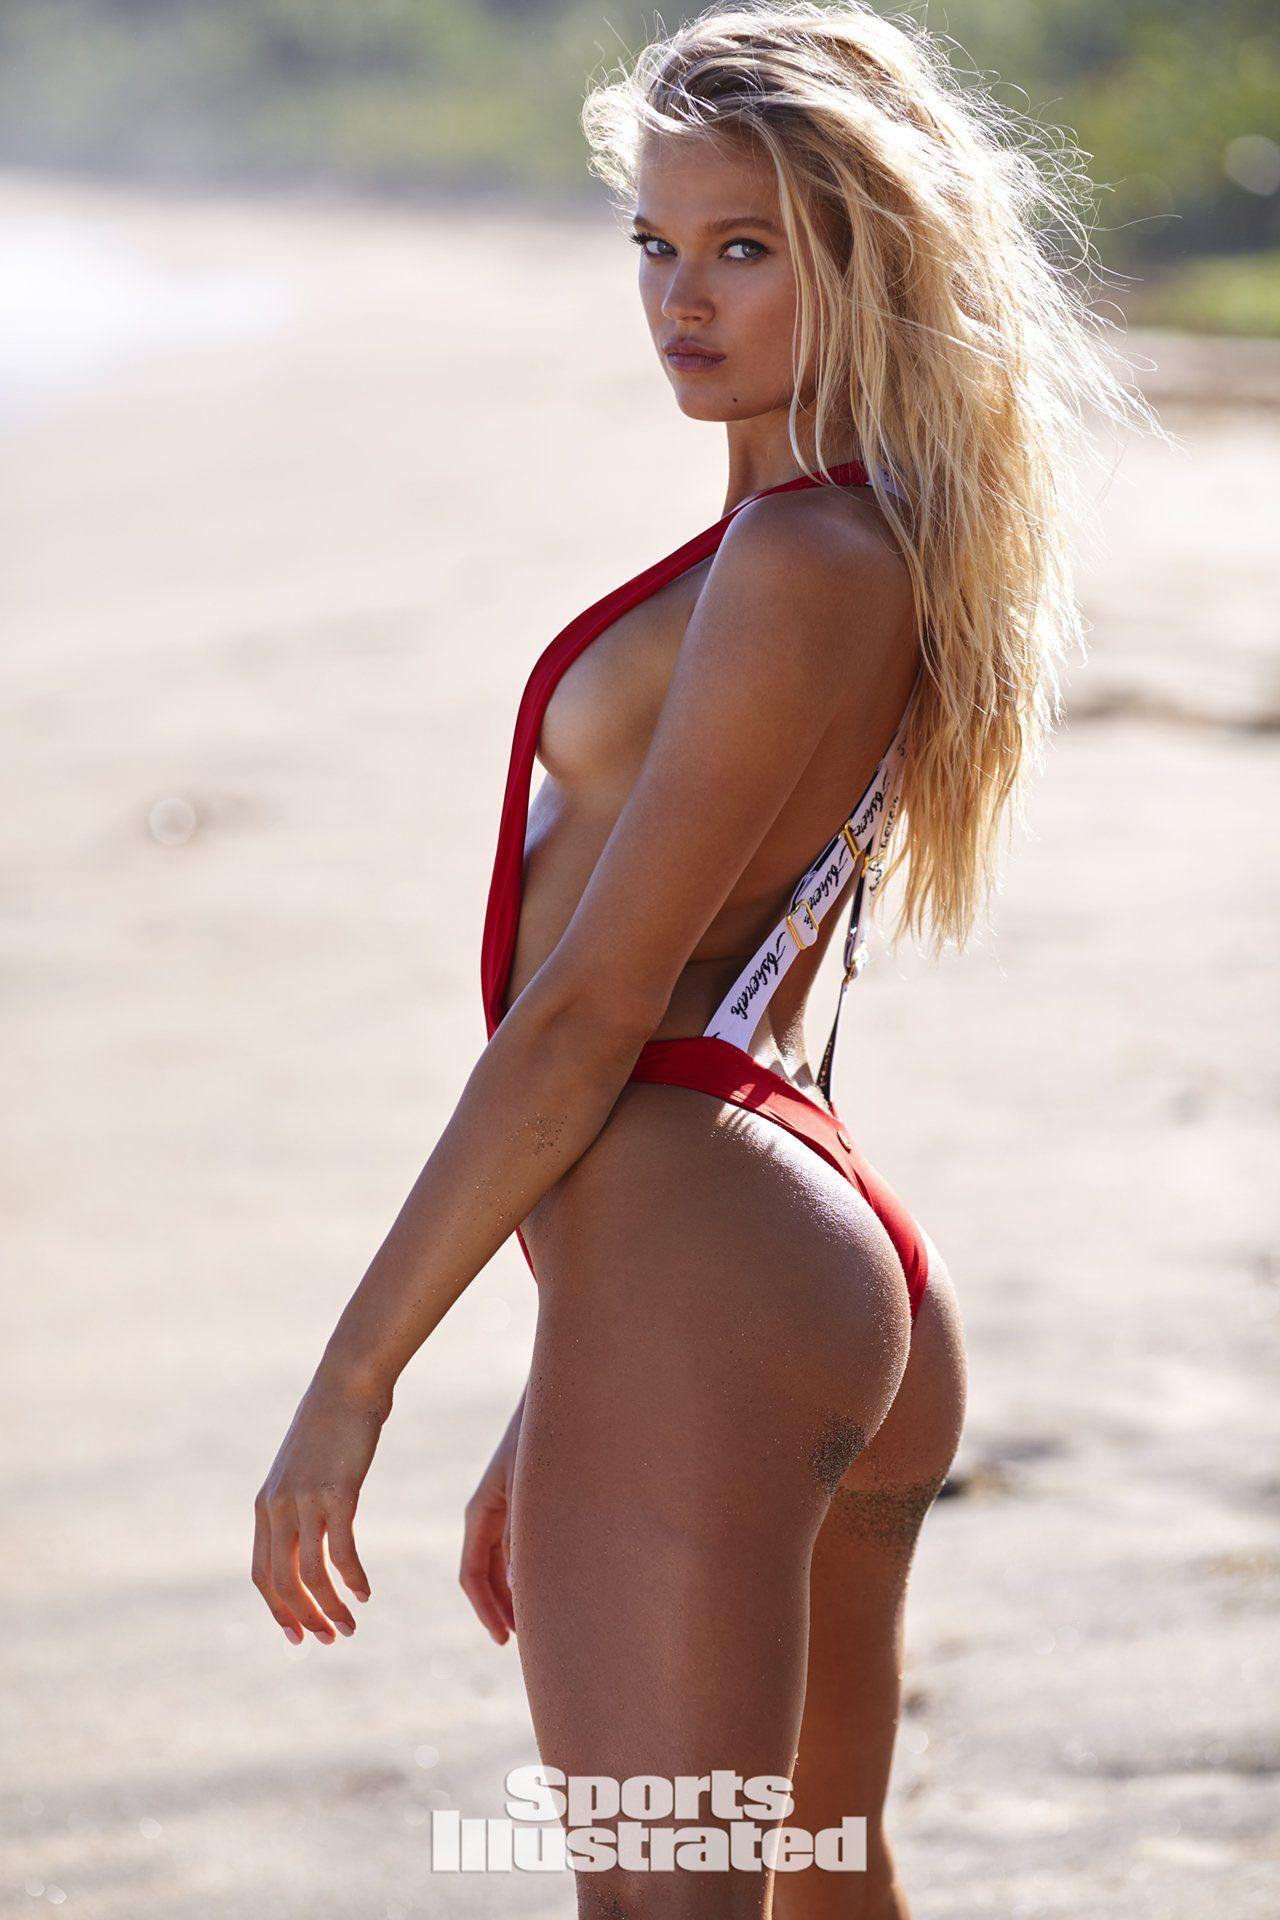 c36b3eb3fb8 Vita Sidorkina was photographed by Josie Clough in Nevis. Swimsuit by  Asherah Swimwear.